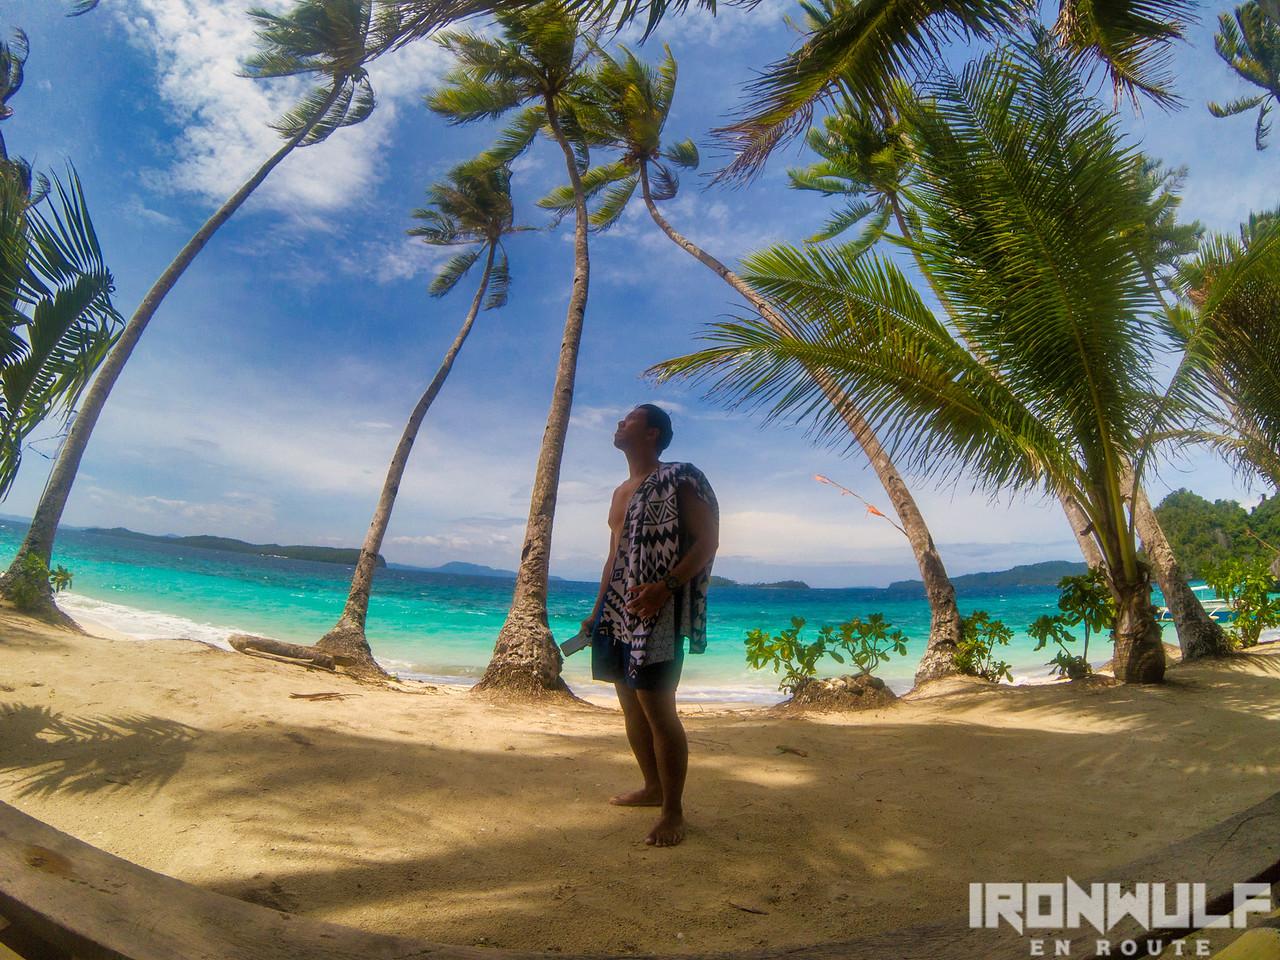 Using the Tesalate Beach Towel at Dinagat Islands